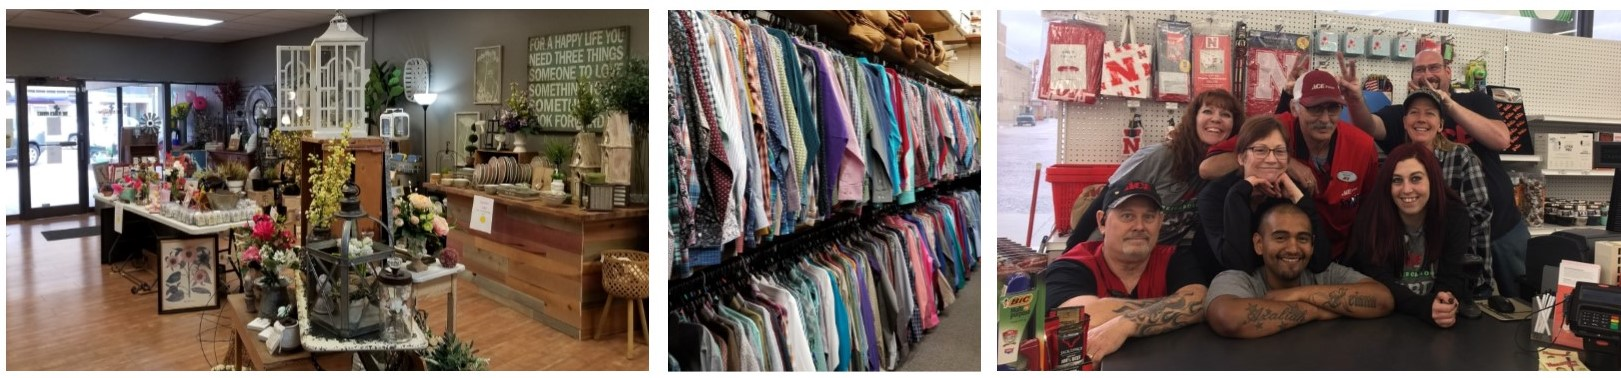 Shopping-Spotlight-webpage-pics-(3).jpg